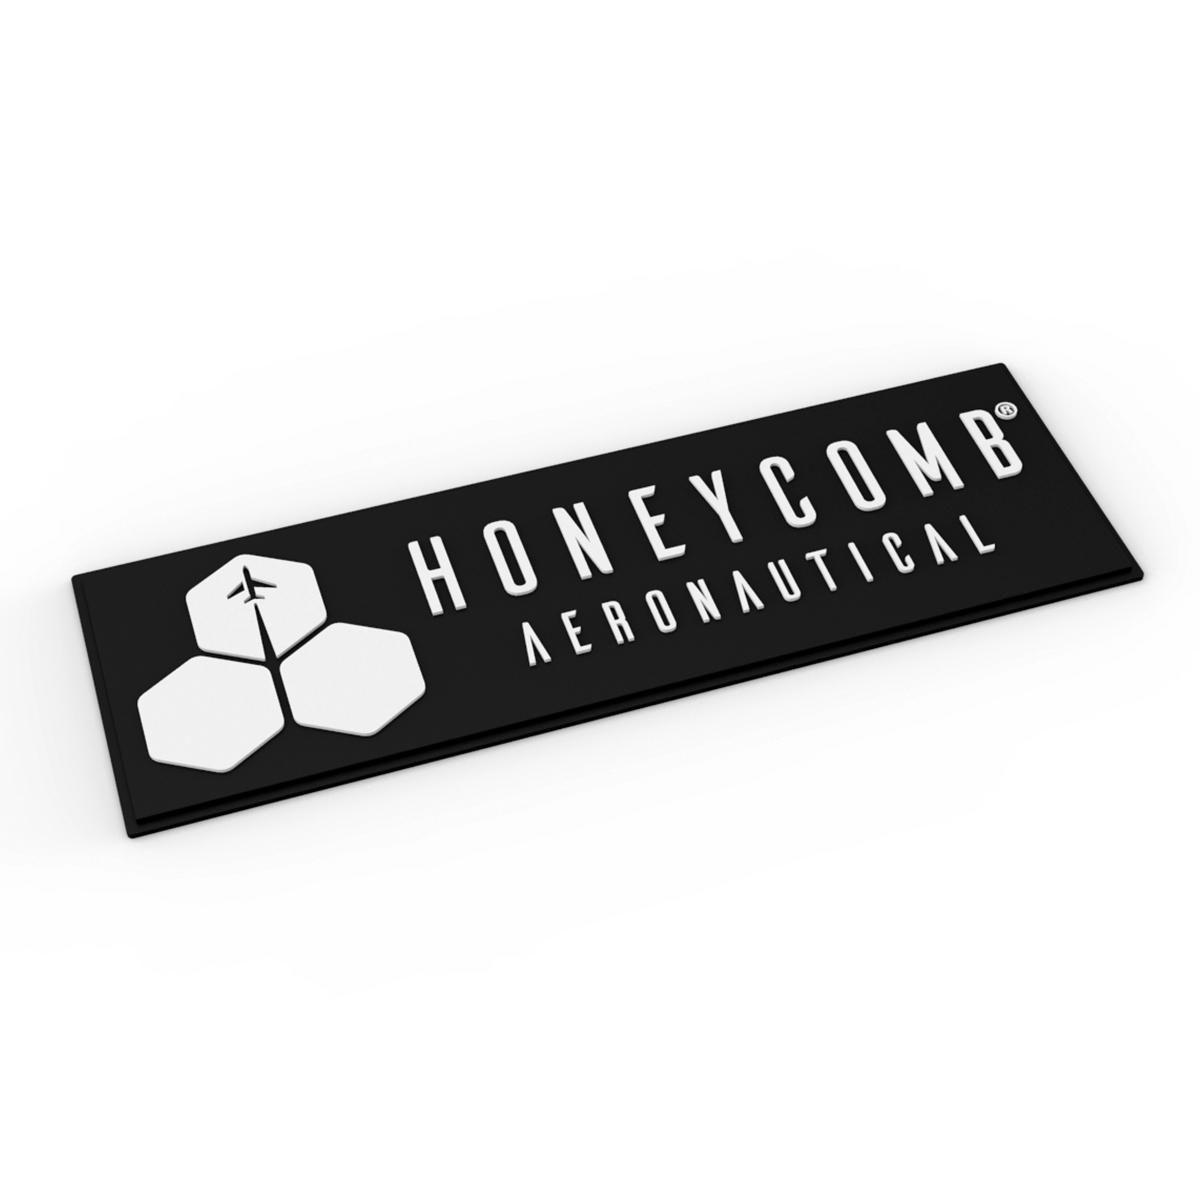 HONEYCOMB DUST COVER For ALPHA YOKE & BRAVO THROTTLE ハニカム ダストカバー フォー アルファ ヨーク & ブラボー スロットル